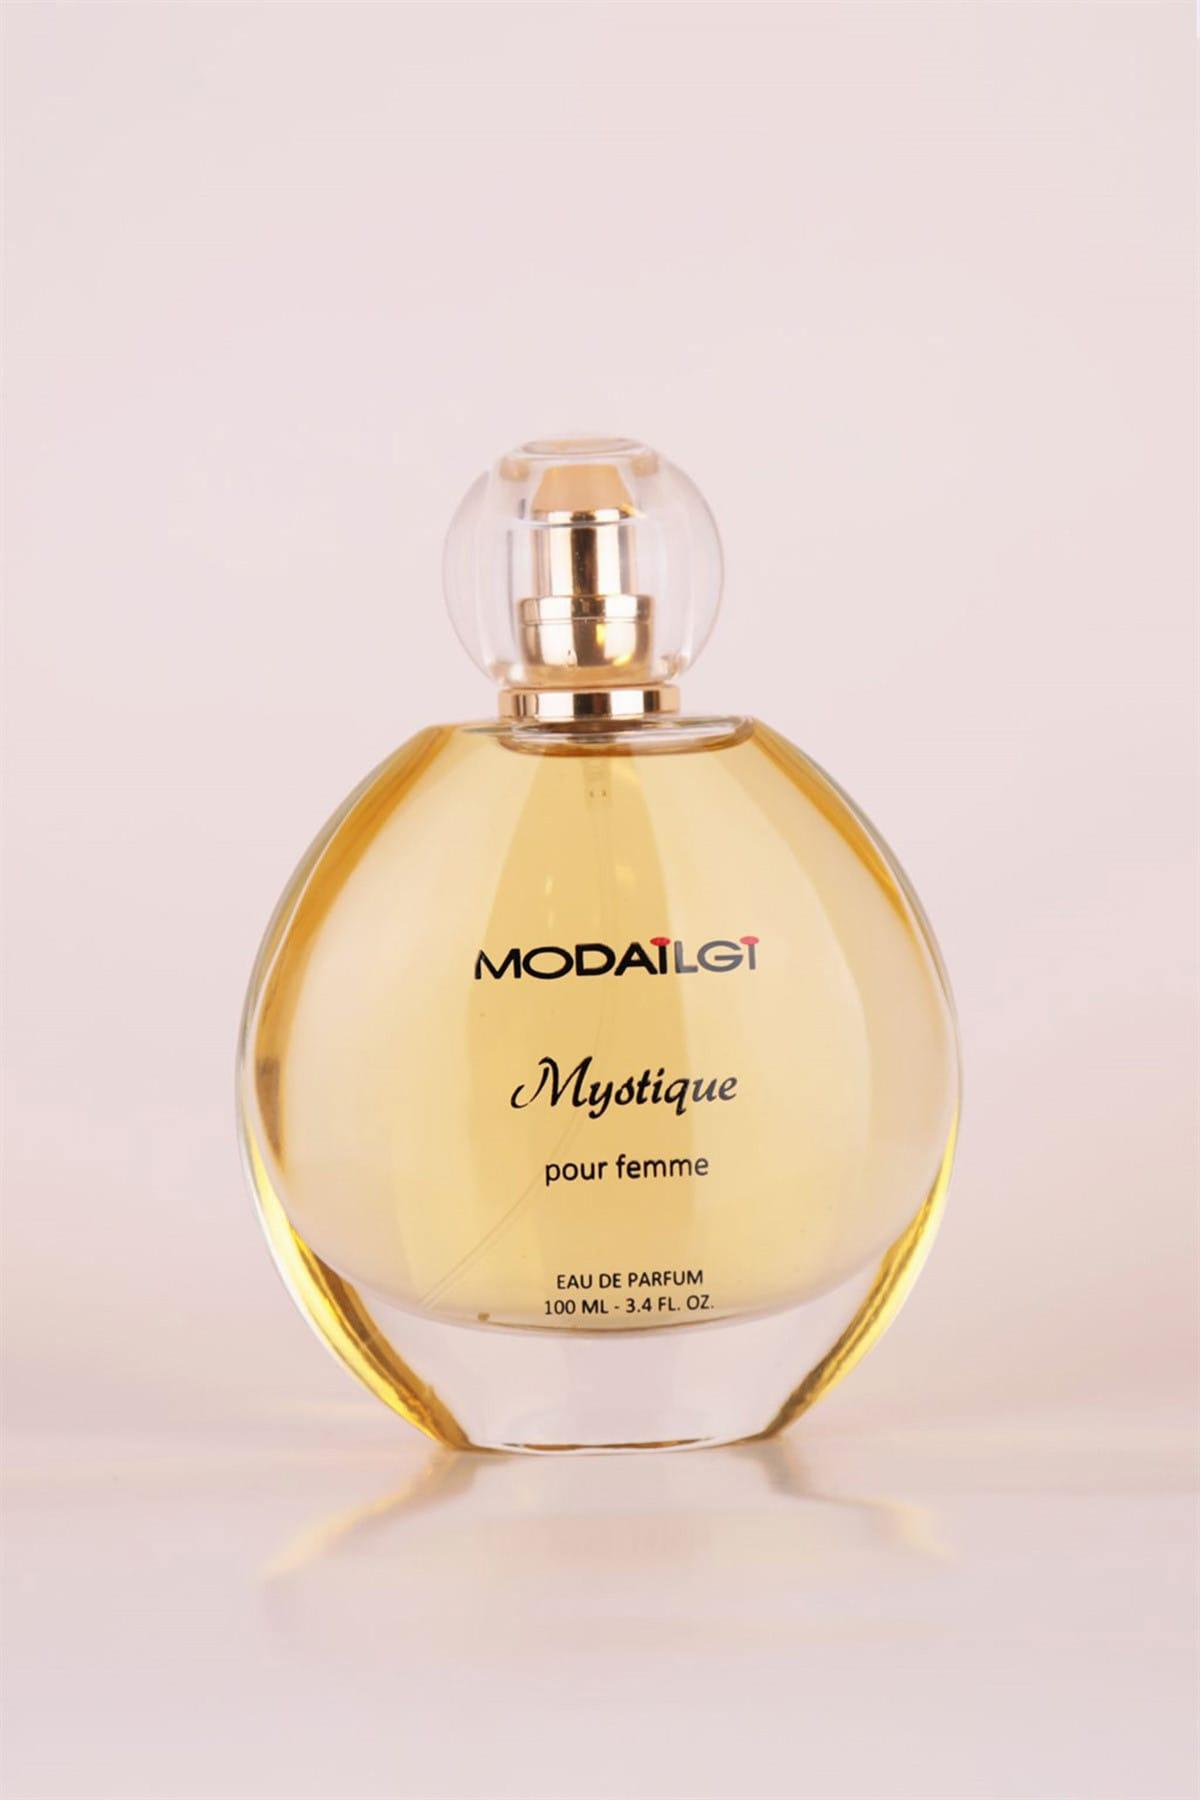 Moda İlgi Modailgi Mystique Parfume 2